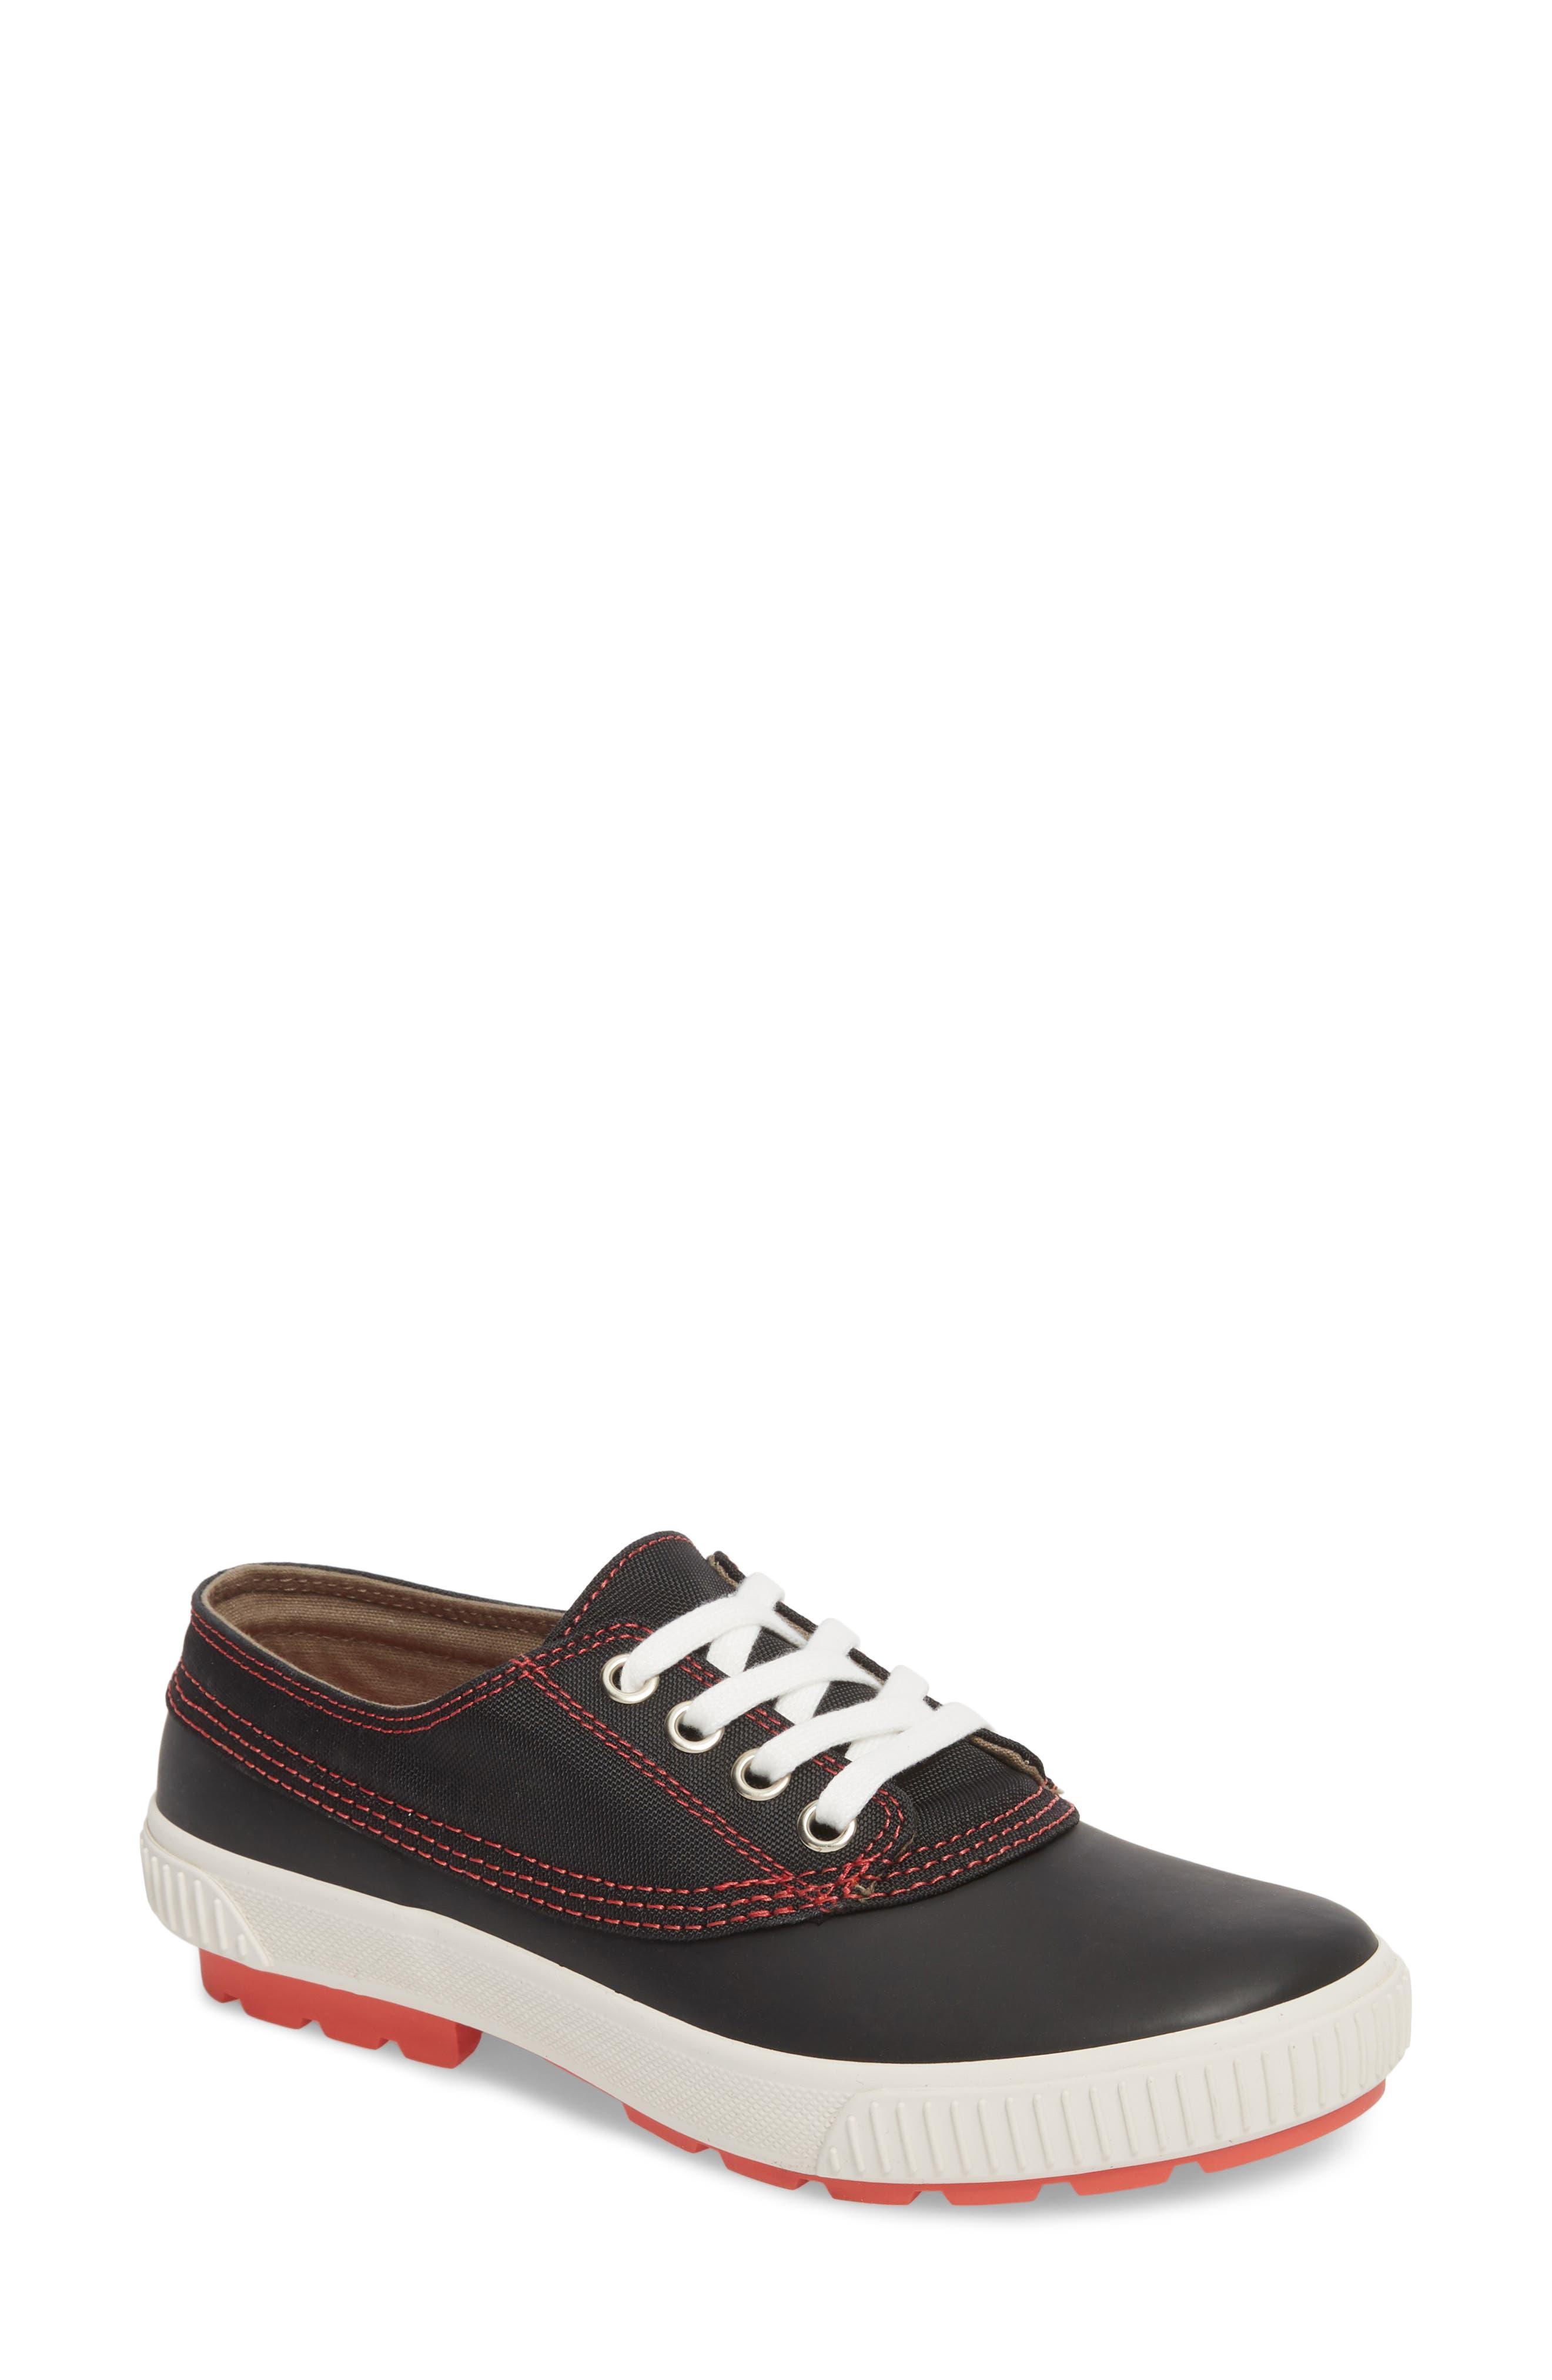 Dash Duck Sneaker,                             Main thumbnail 1, color,                             Black/ Coral